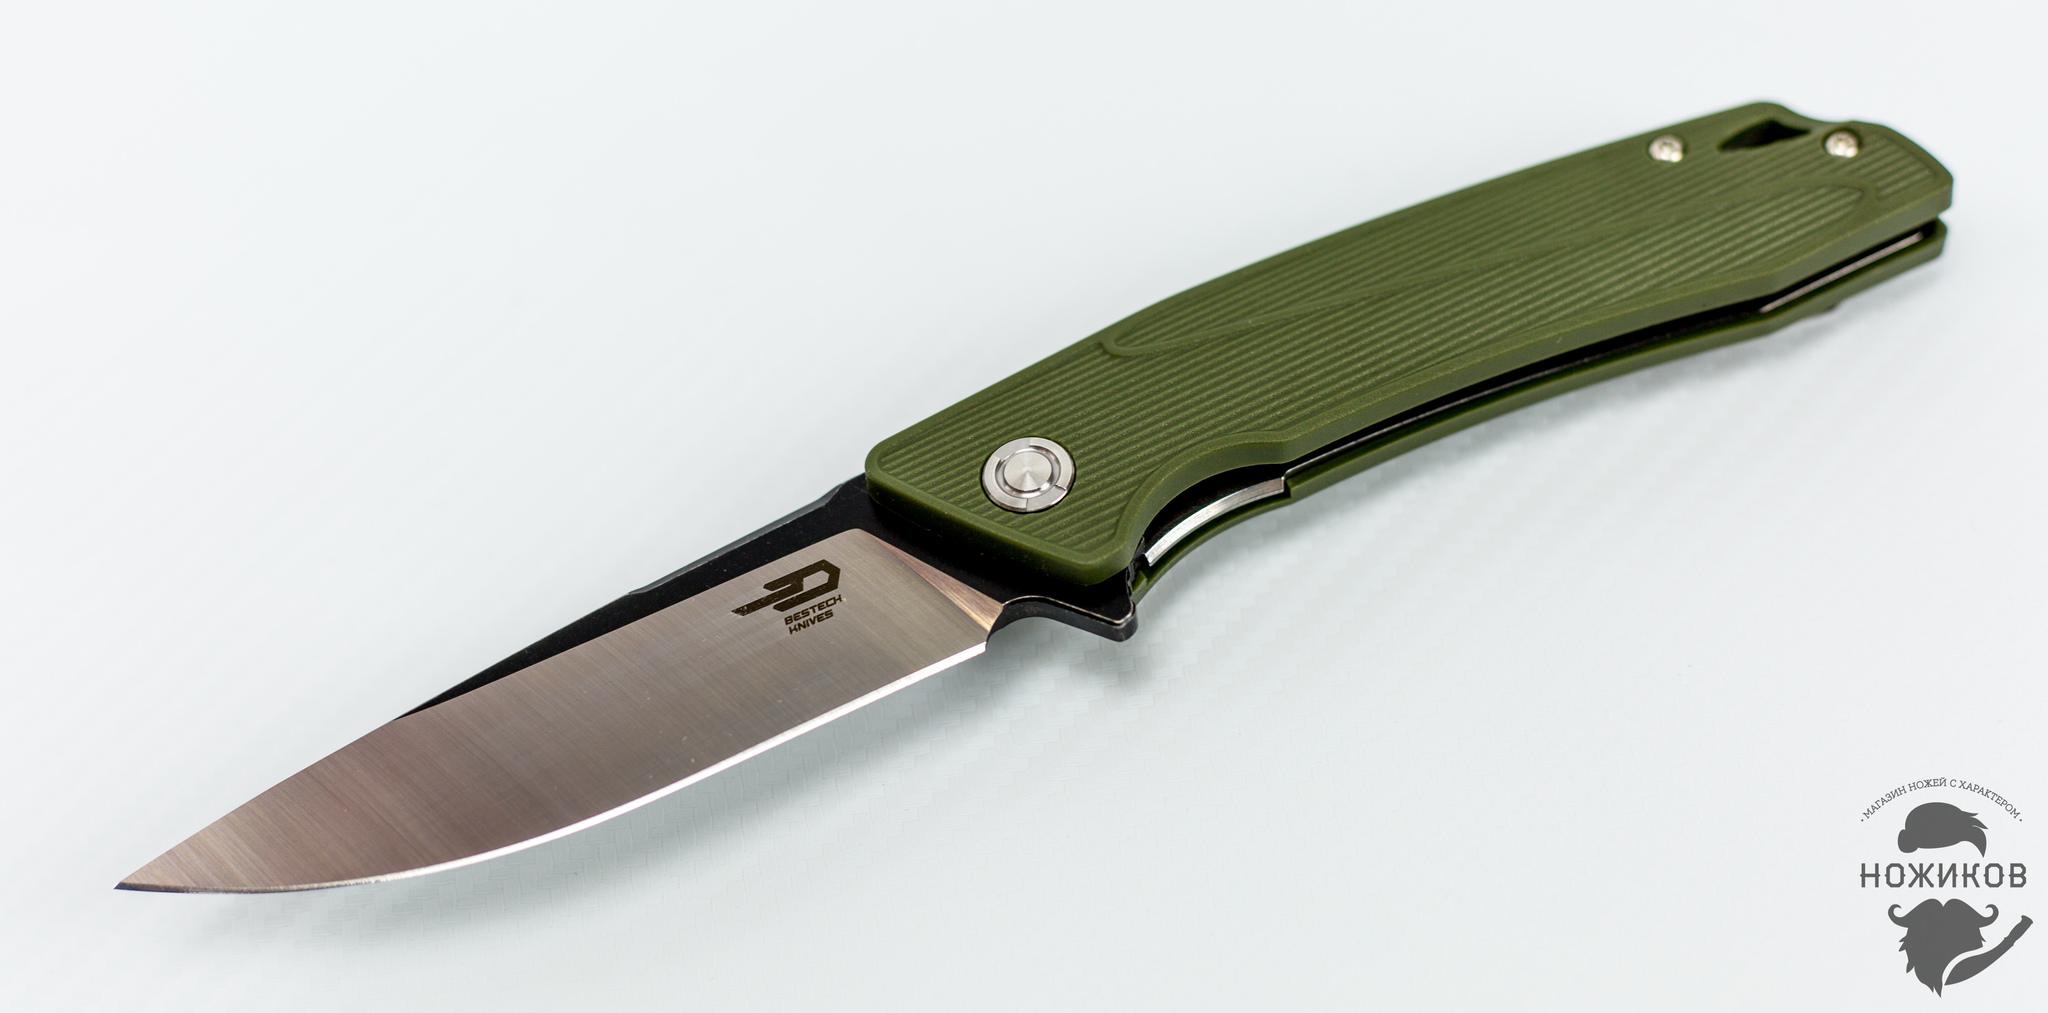 Складной нож Bestech Spike BG09B-1, сталь Sandvik 12C27 от Bestech Knives